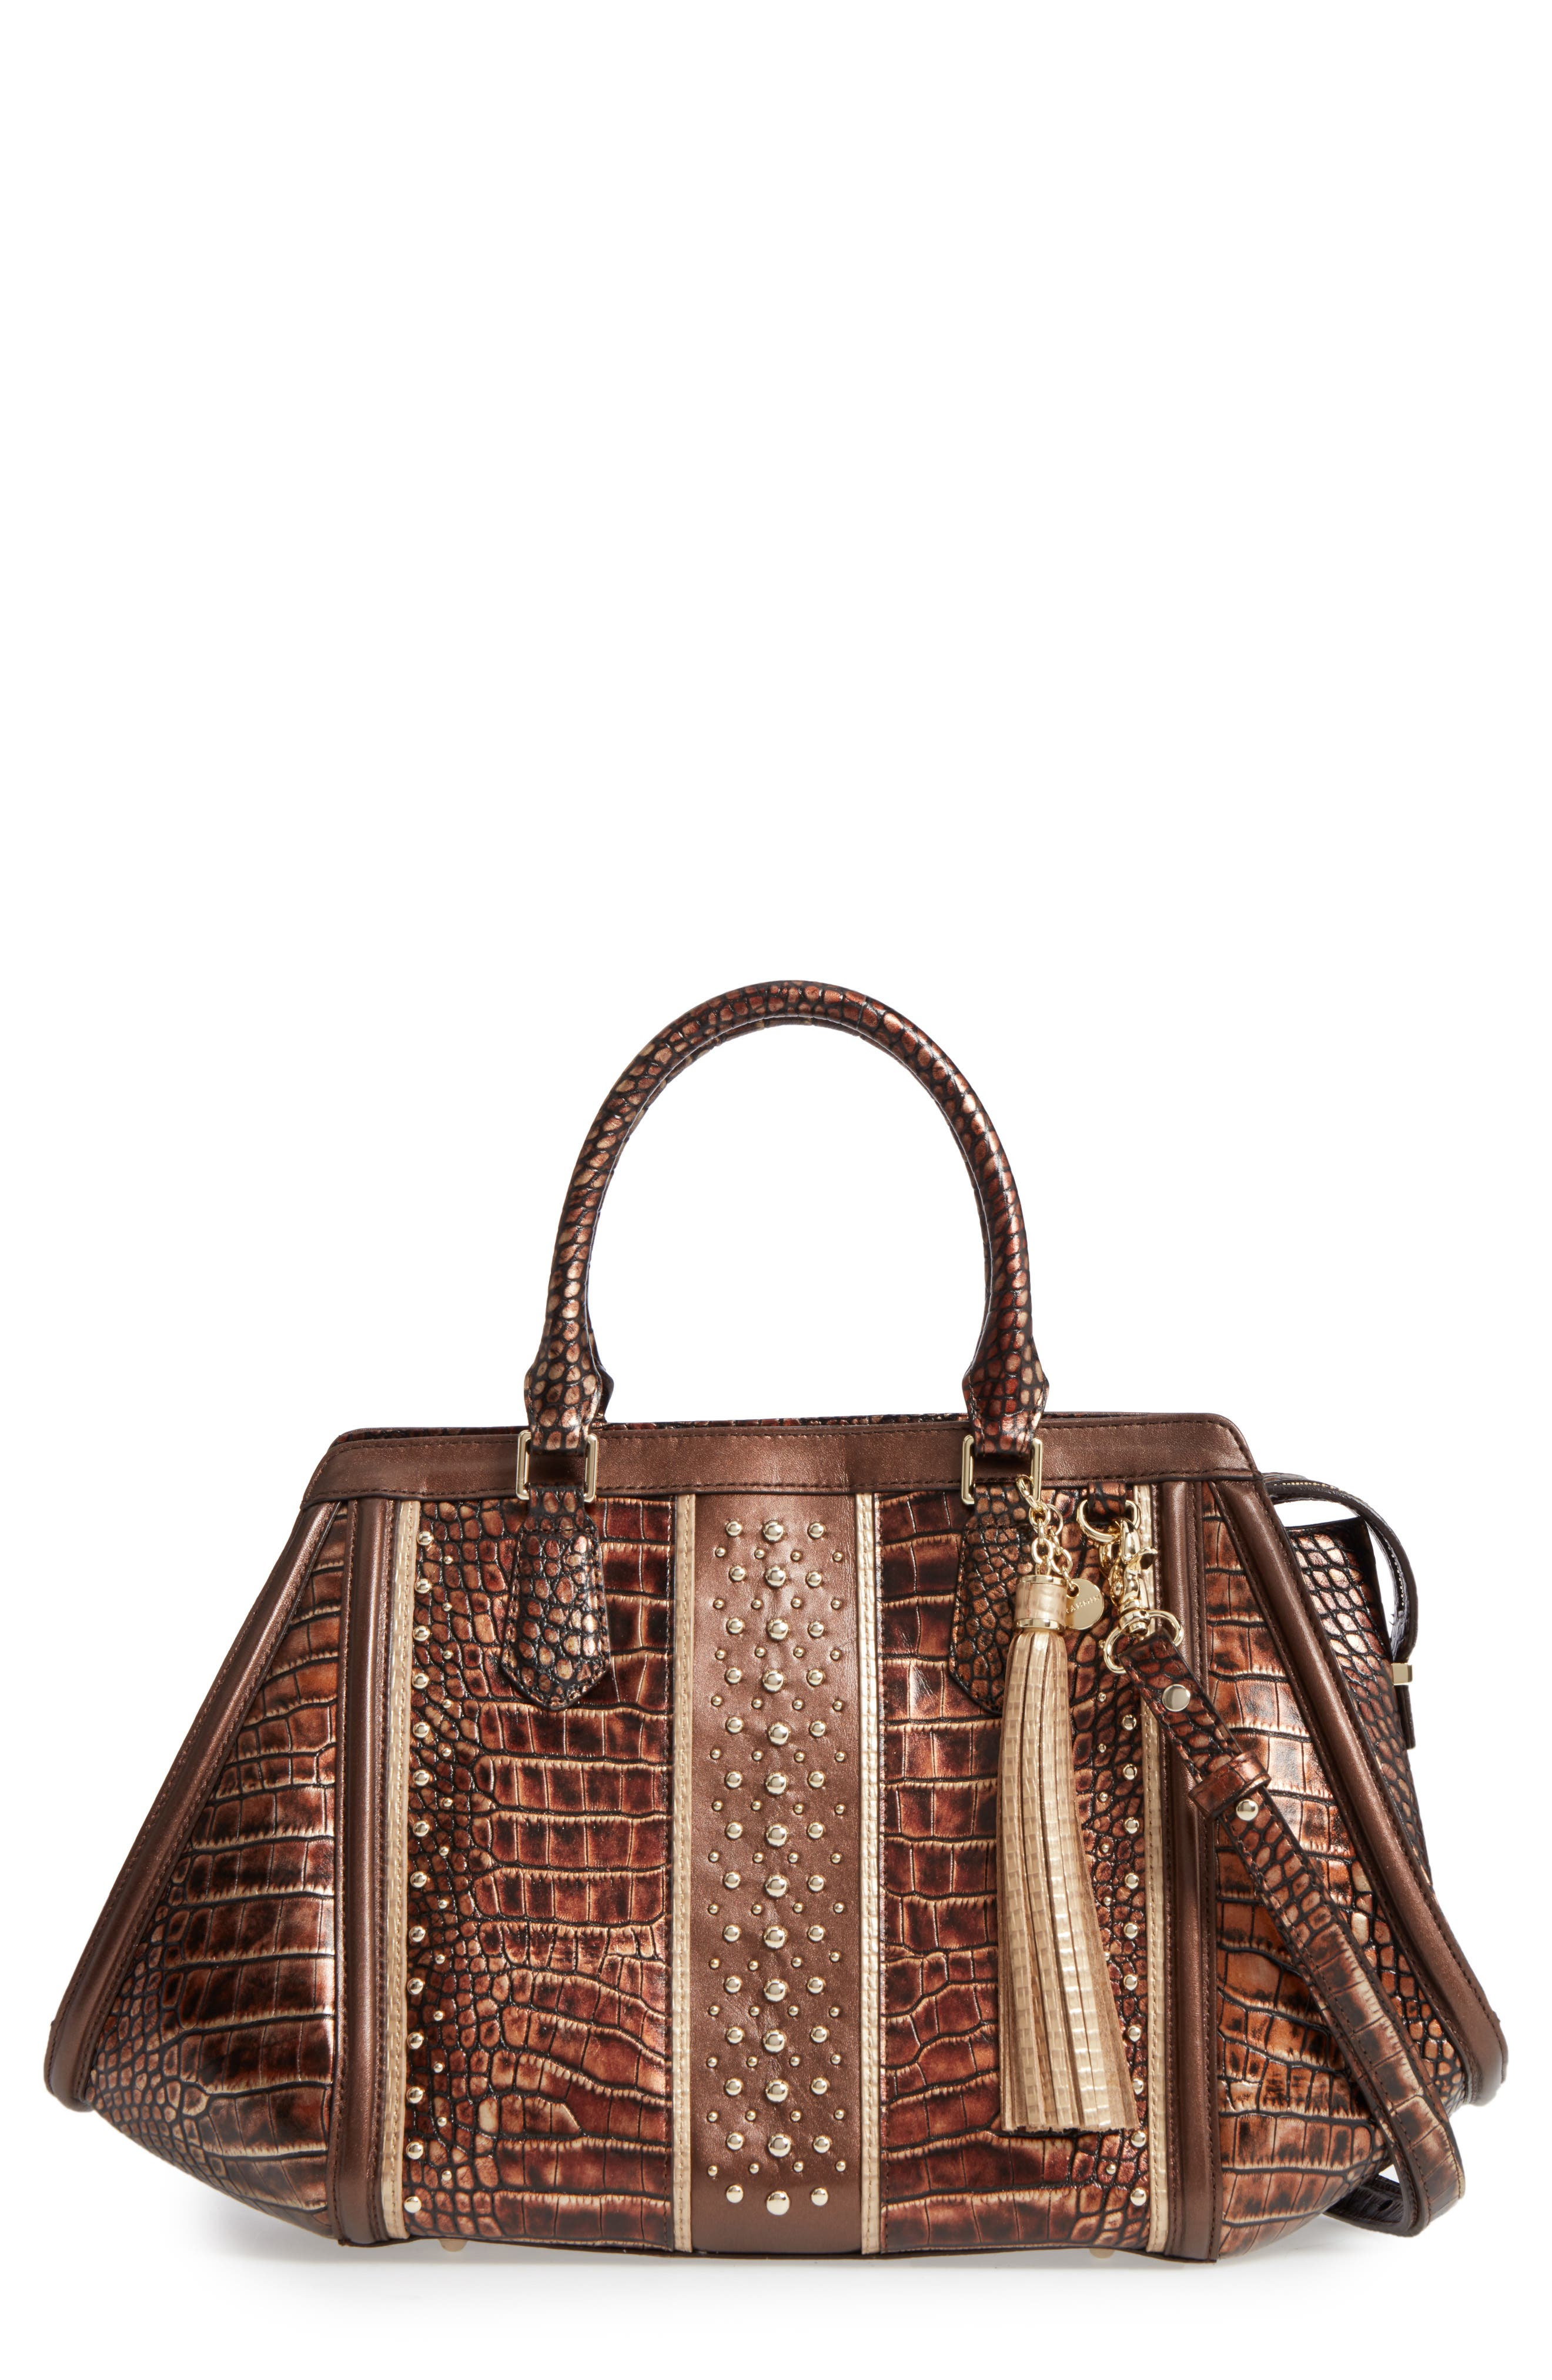 Alternate Image 1 Selected - Brahmin Milan Arden Embossed Leather Satchel